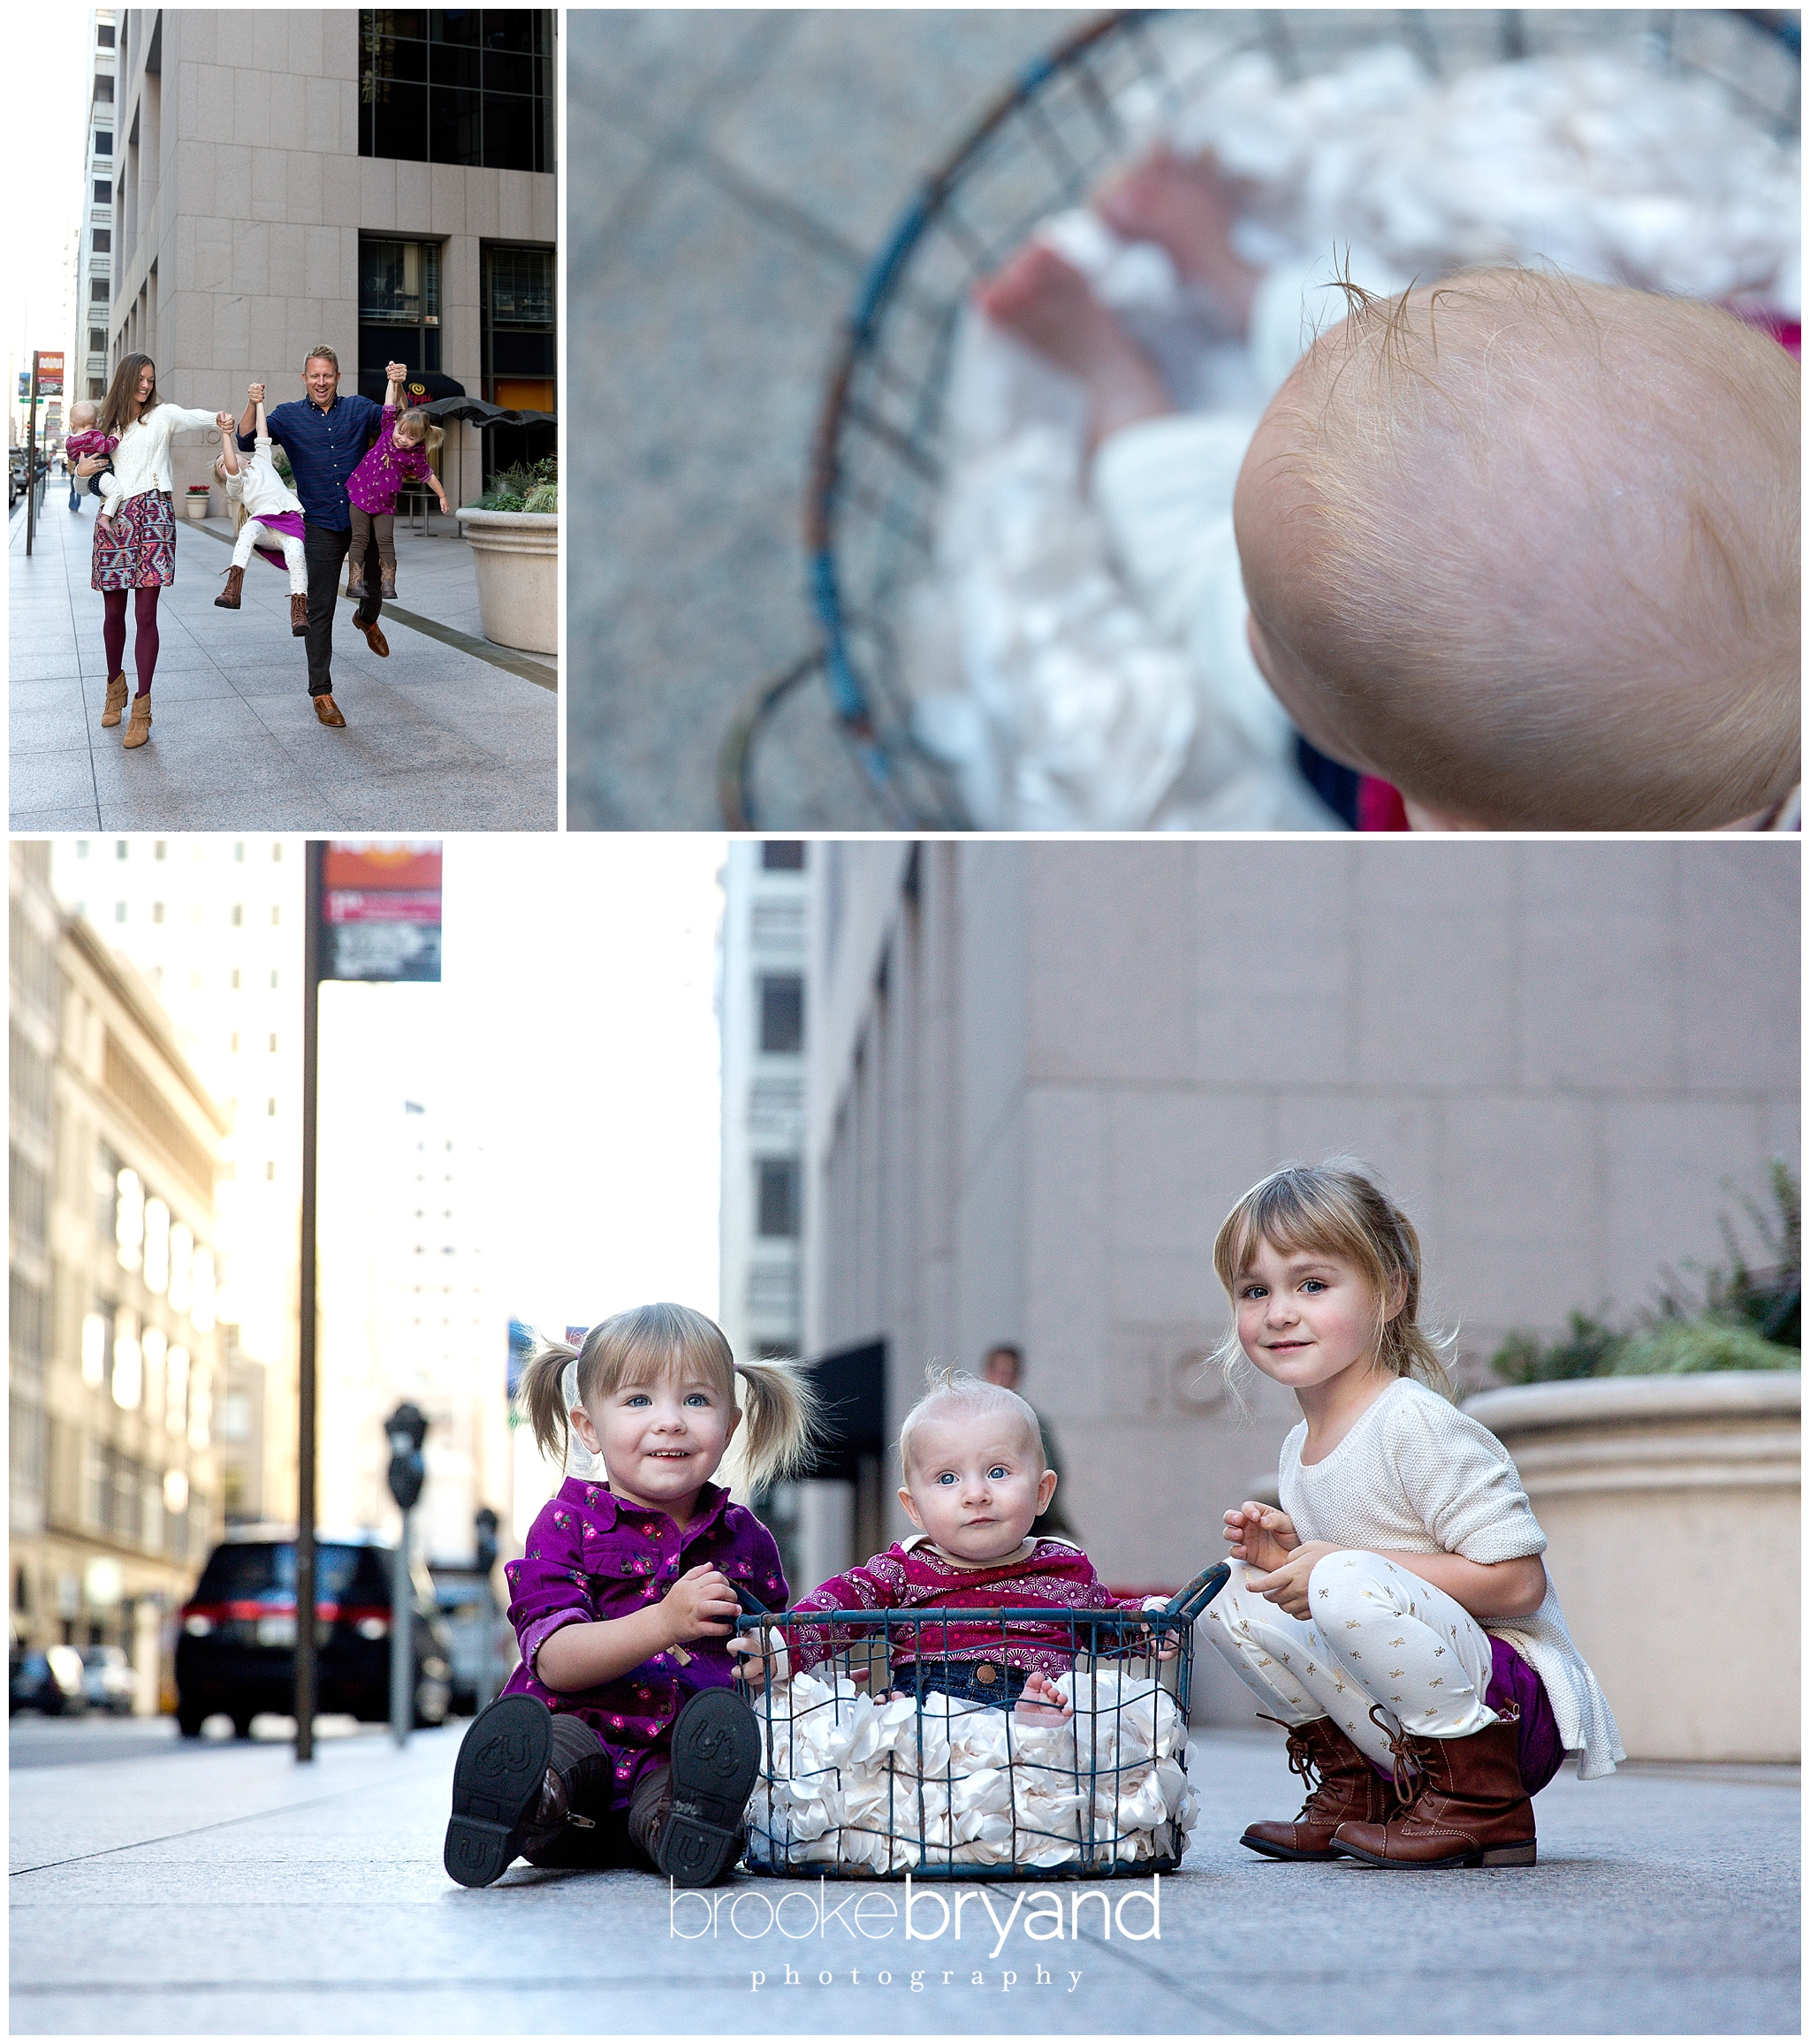 11.2014-james-san-francisco-urban-downtown-family-photoshoot-BBP_1000_BrookeBryand.jpg